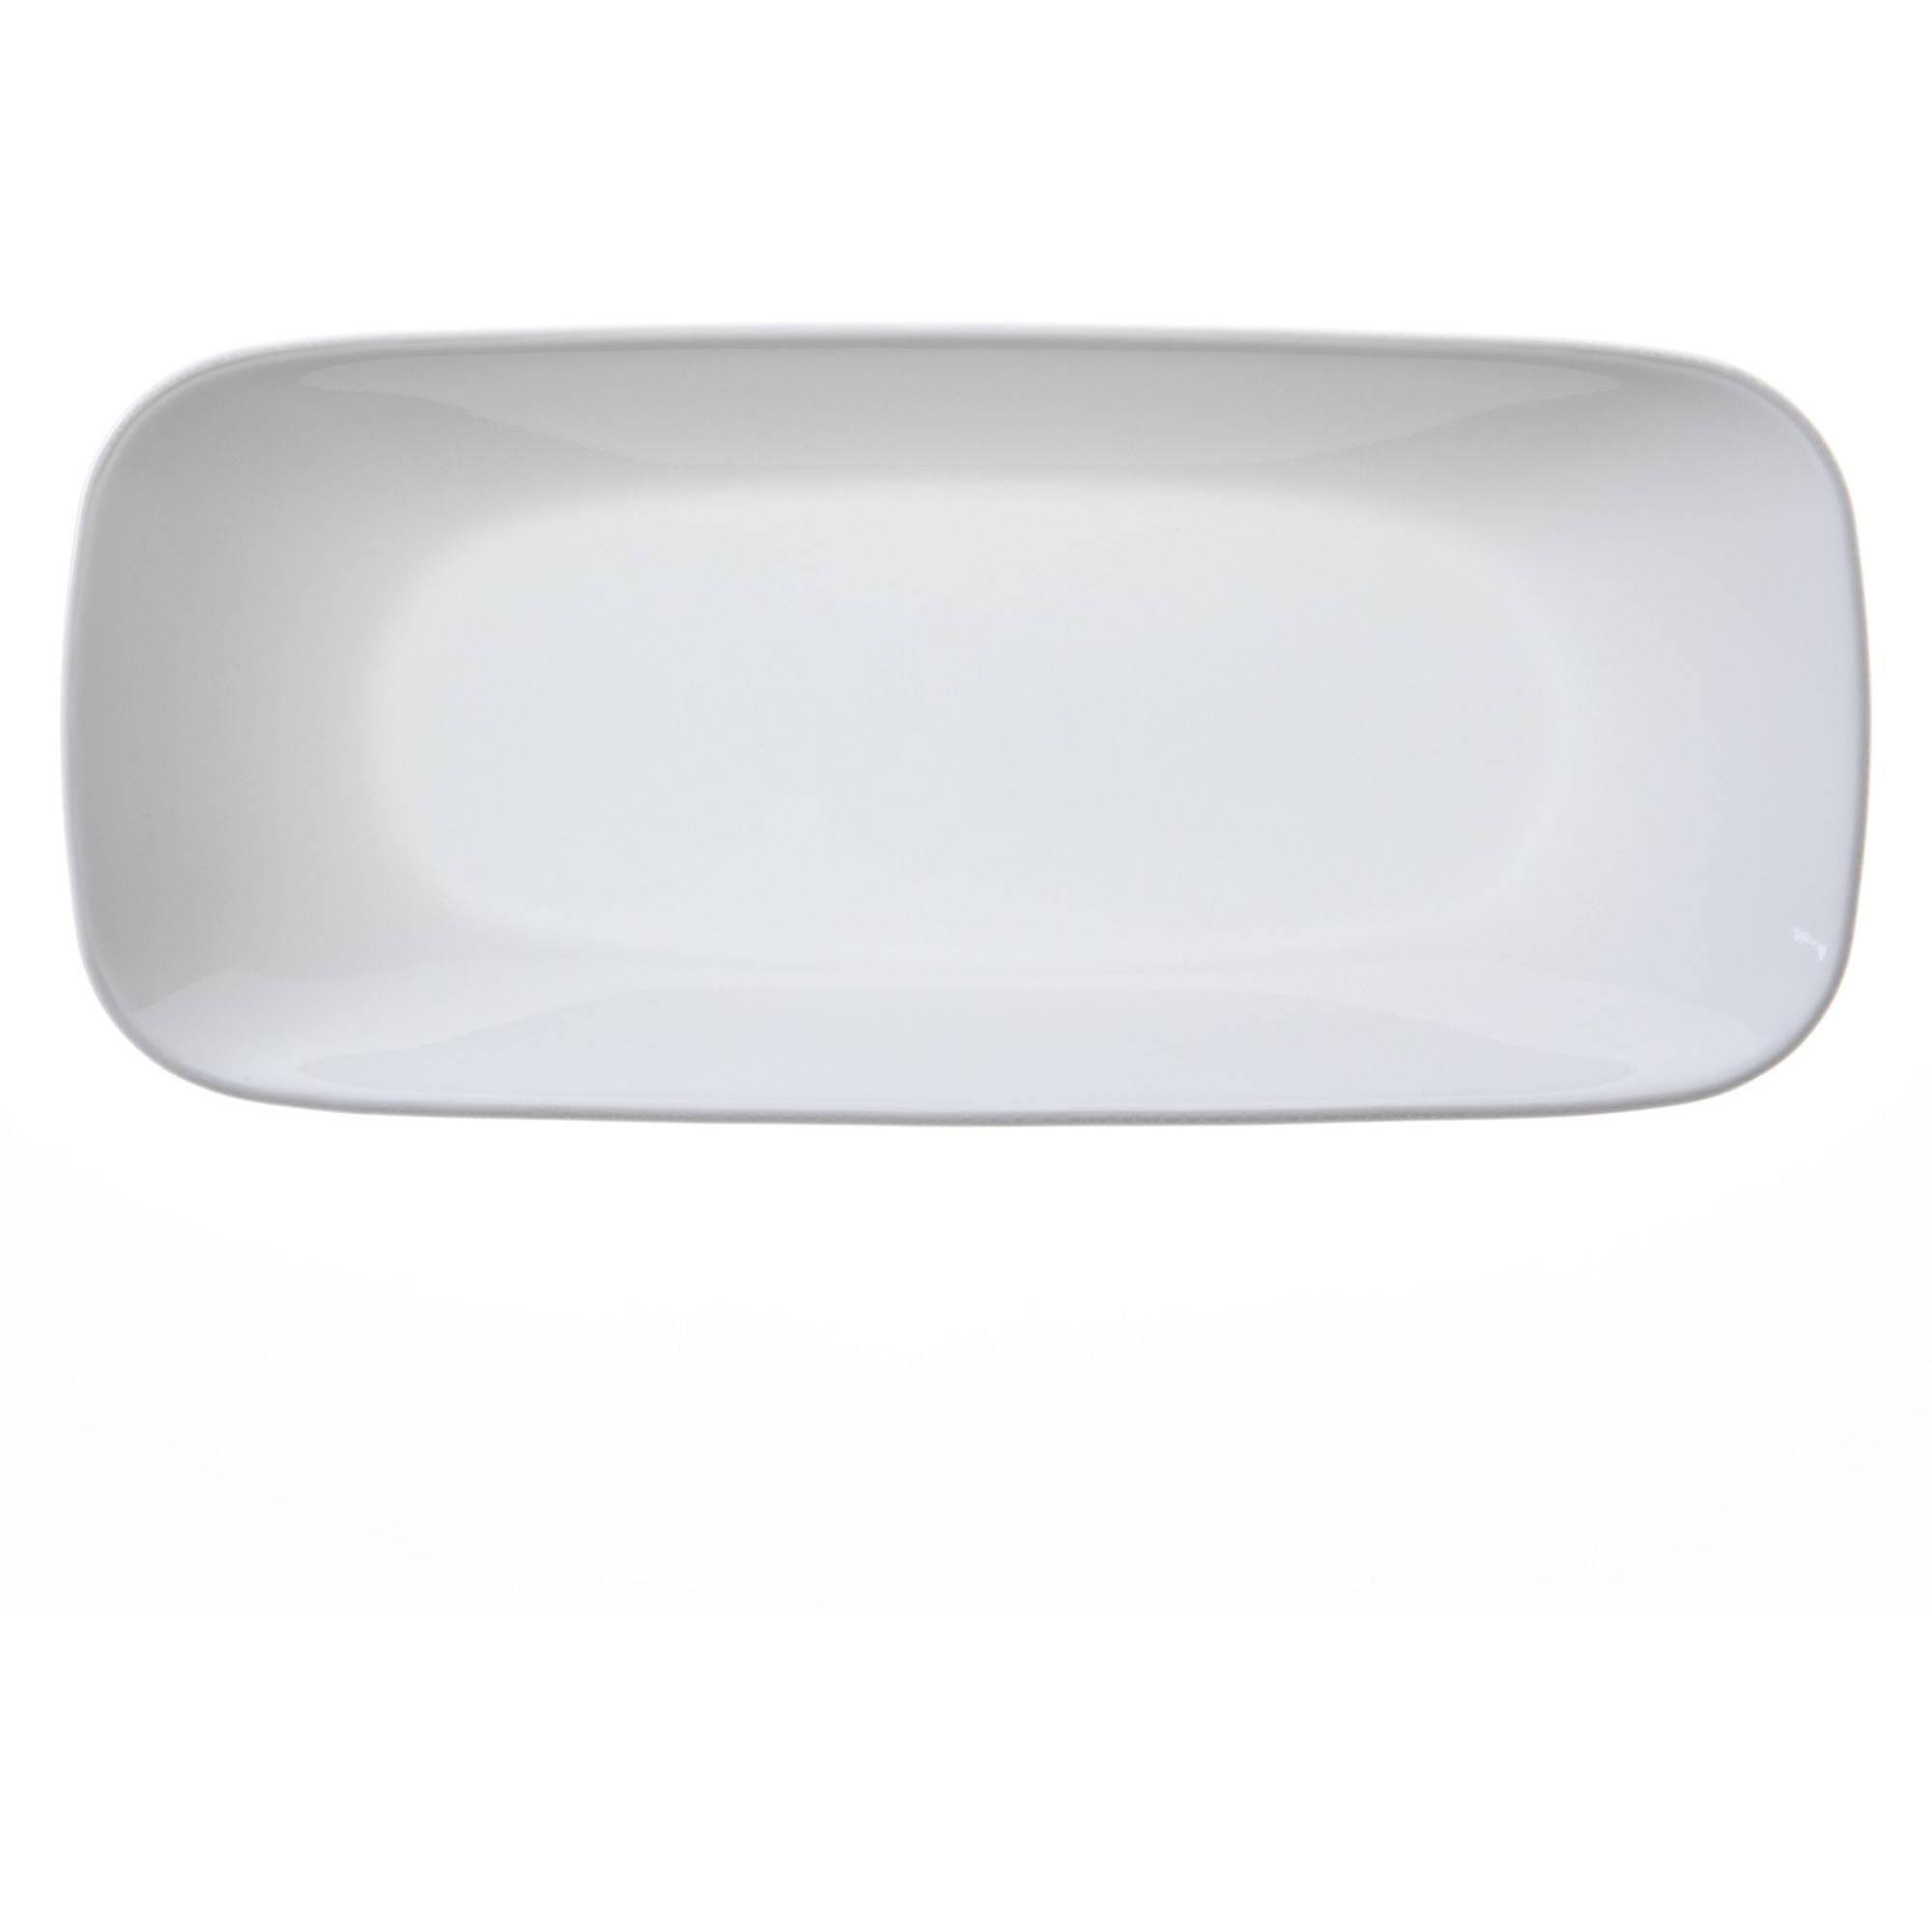 Corelle Square Round 10-1/2-Inch Serving Tray, Pure White